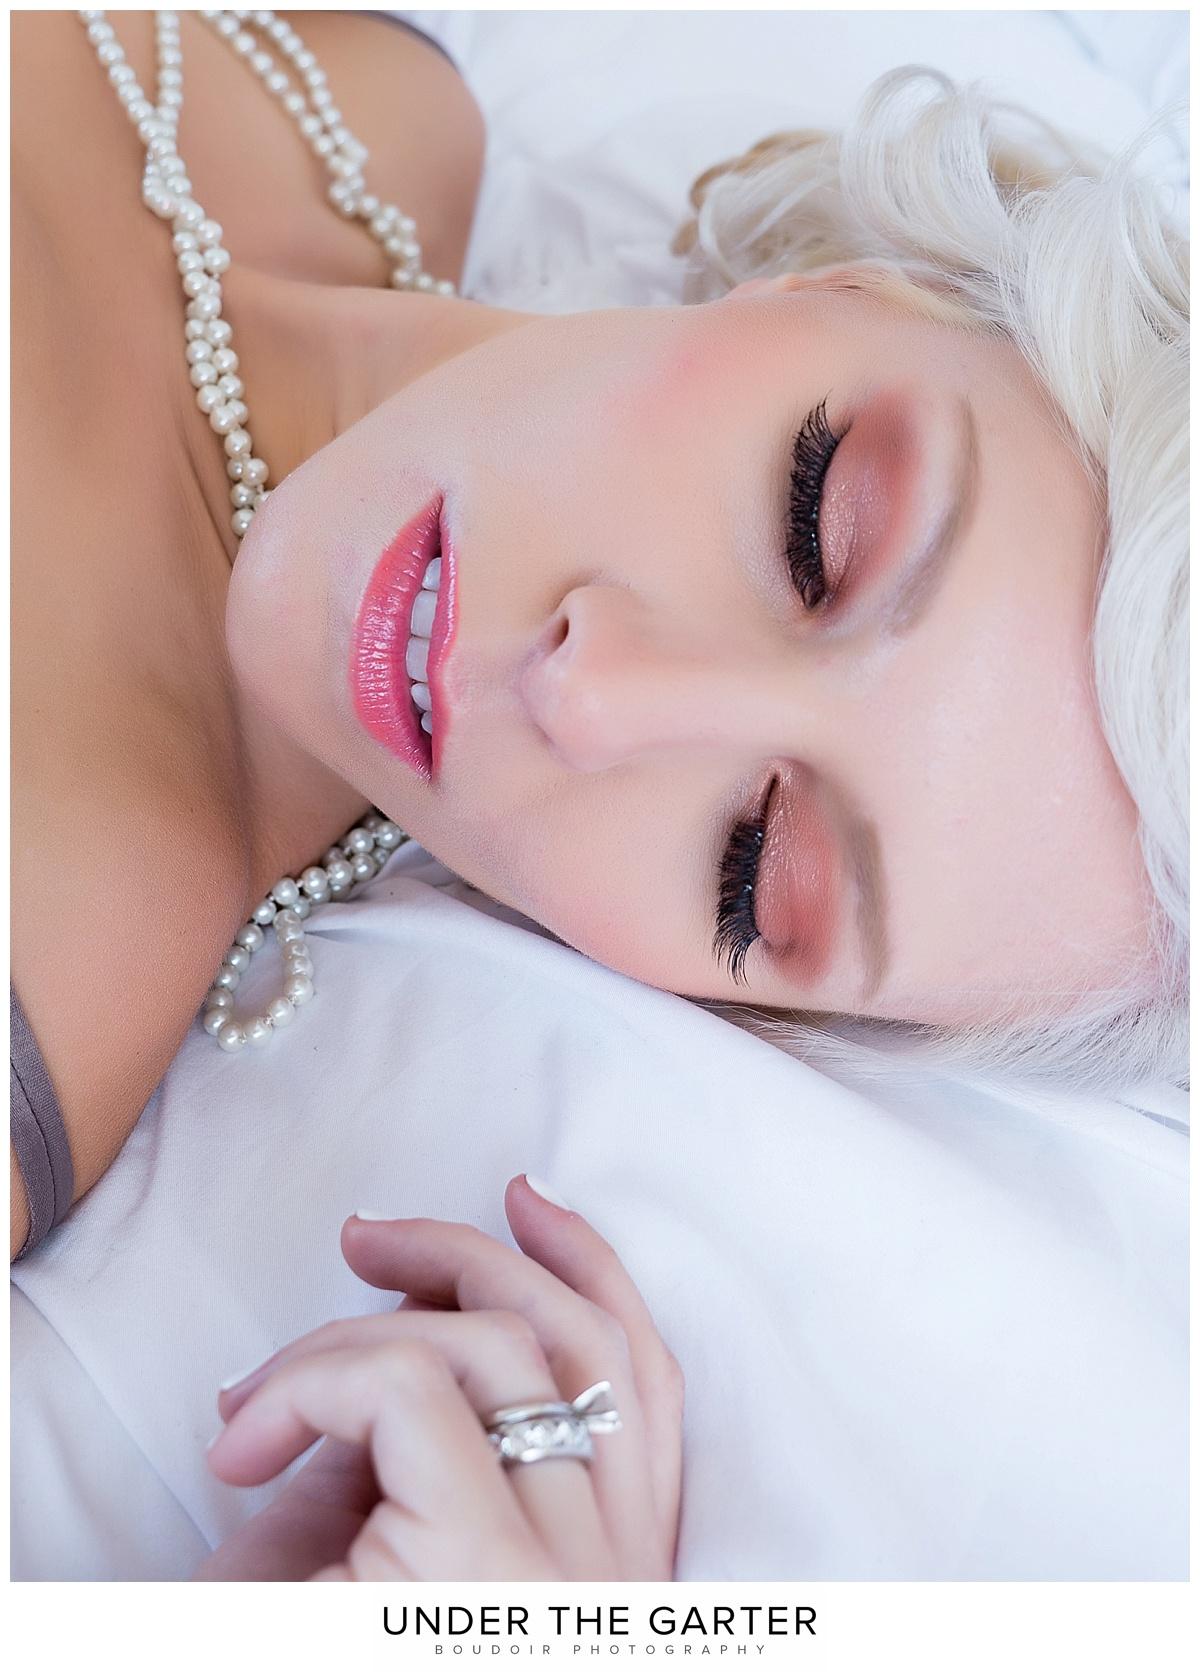 boudoir photography denver eye makeup detail.jpg